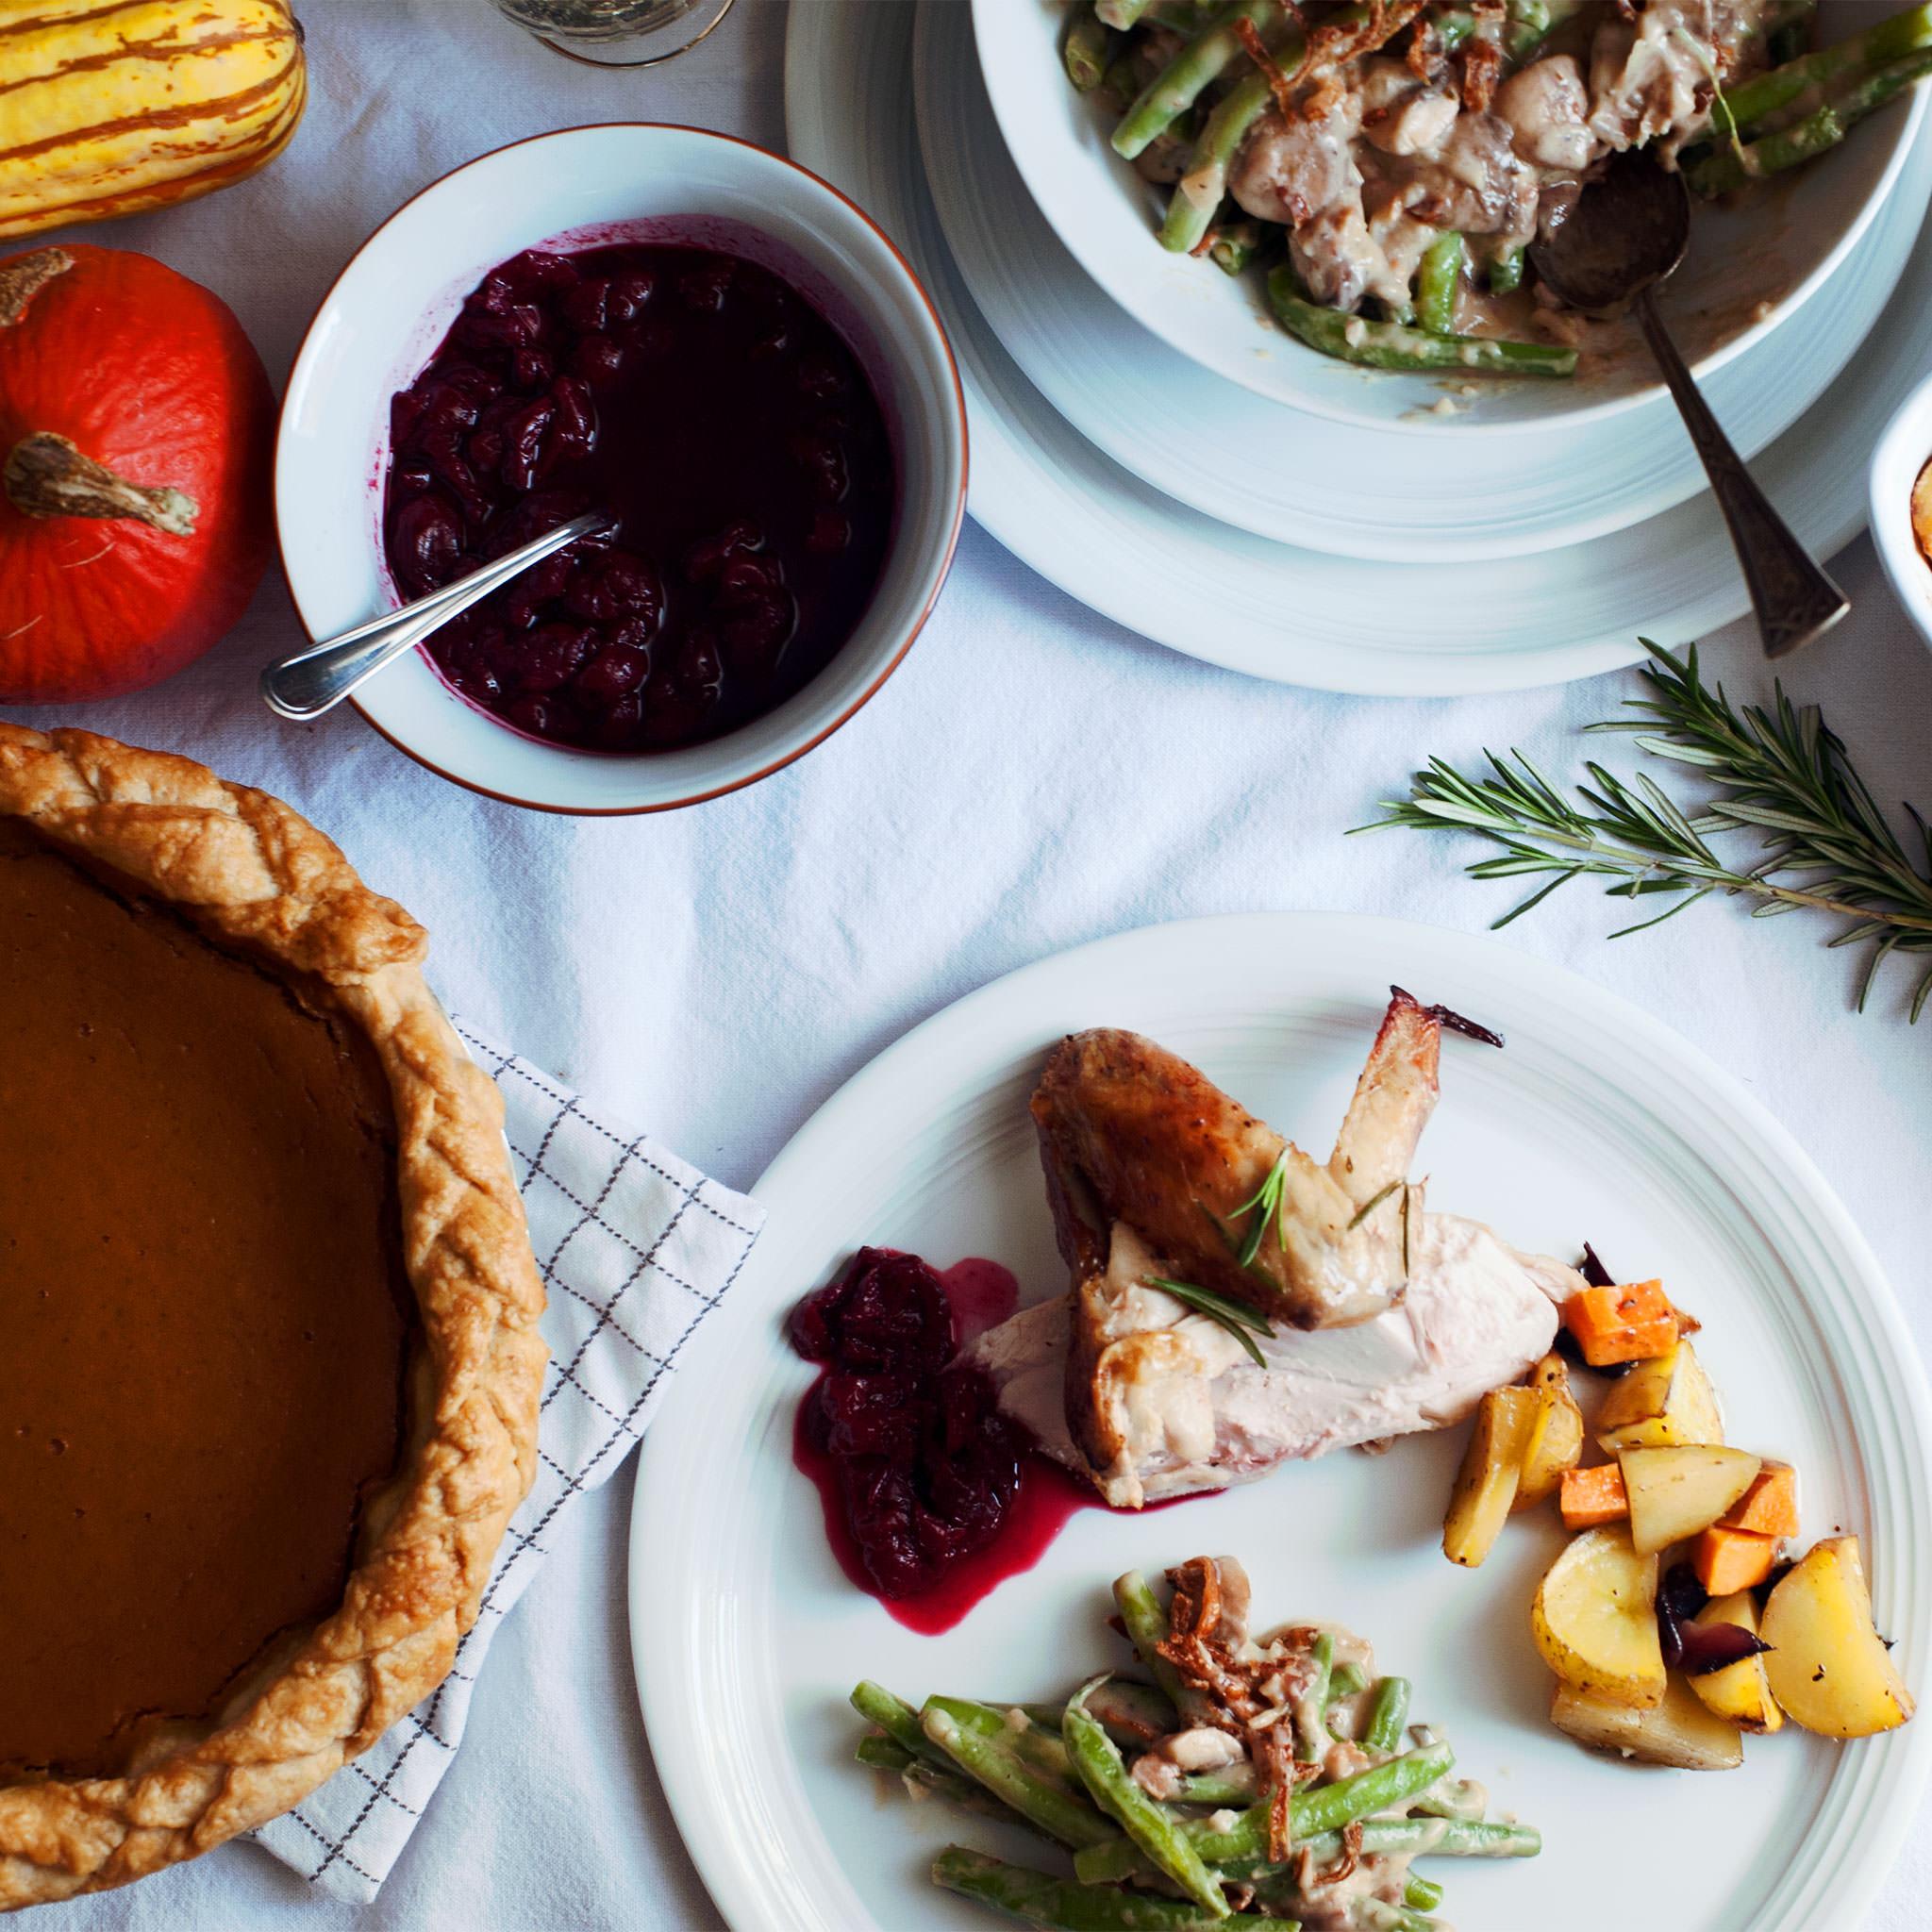 Fantastisch Amerikanische Küche Rezepte Fotos - Heimat Ideen ...